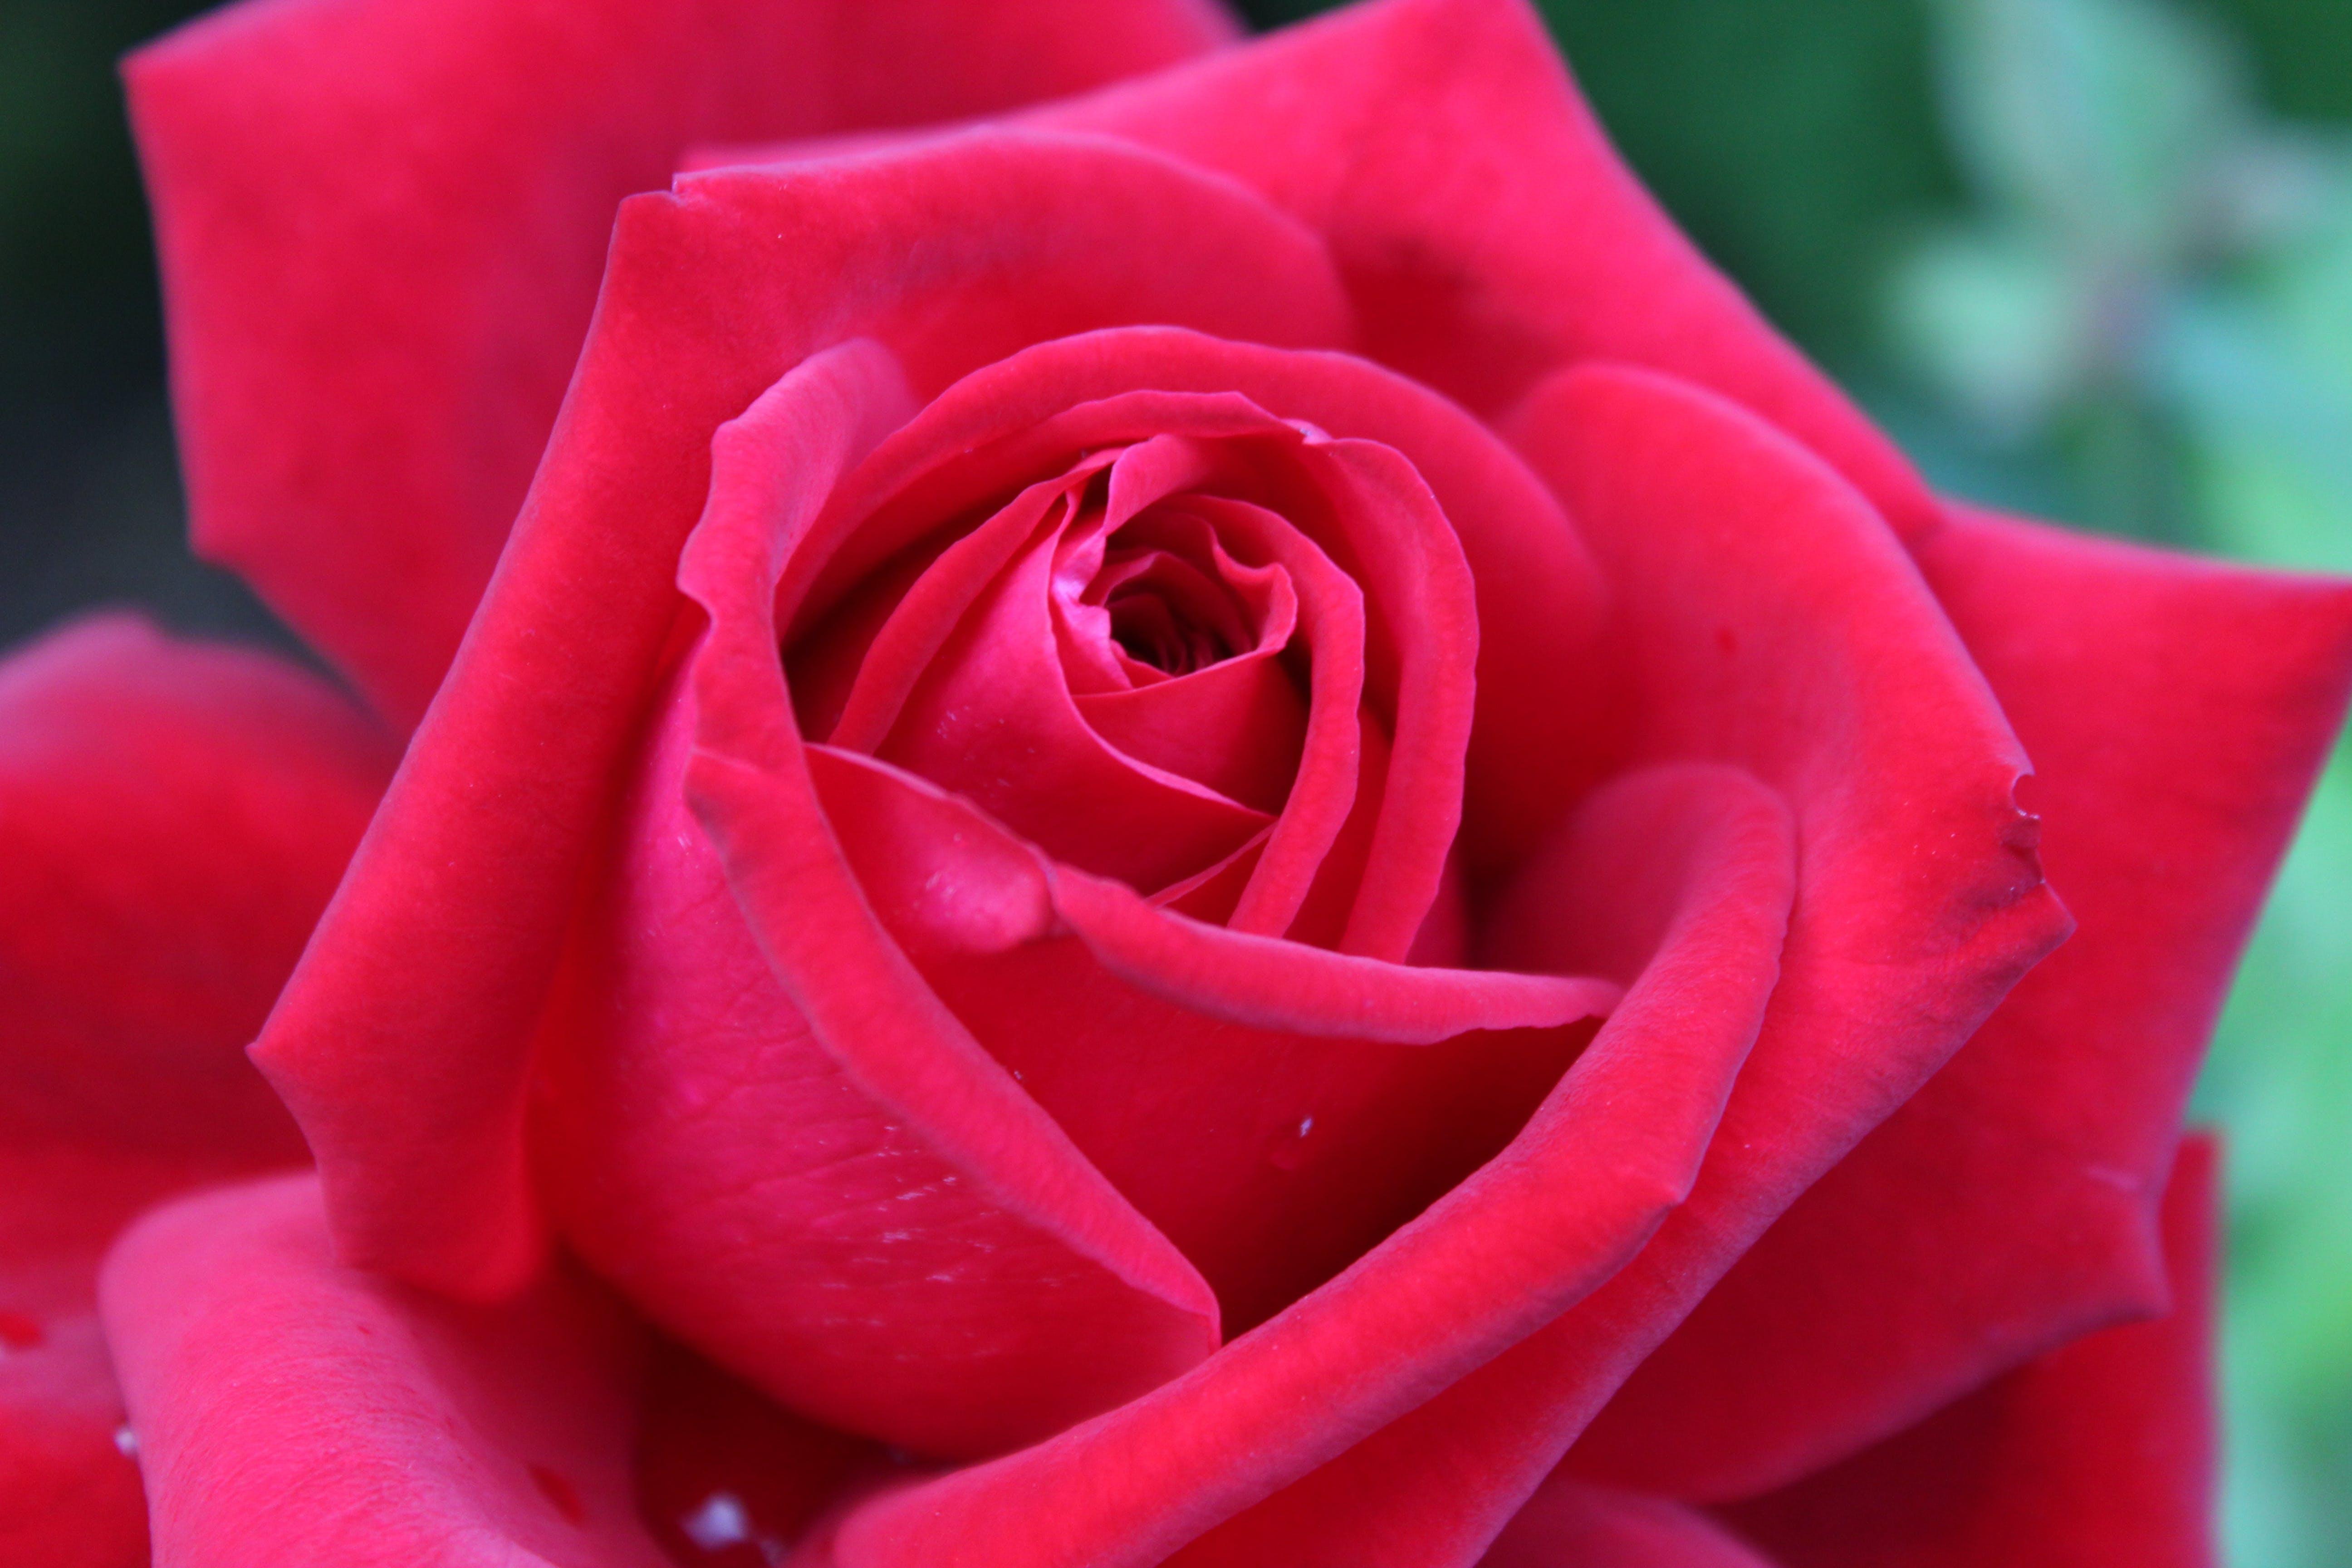 Free stock photo of nature, rose bud